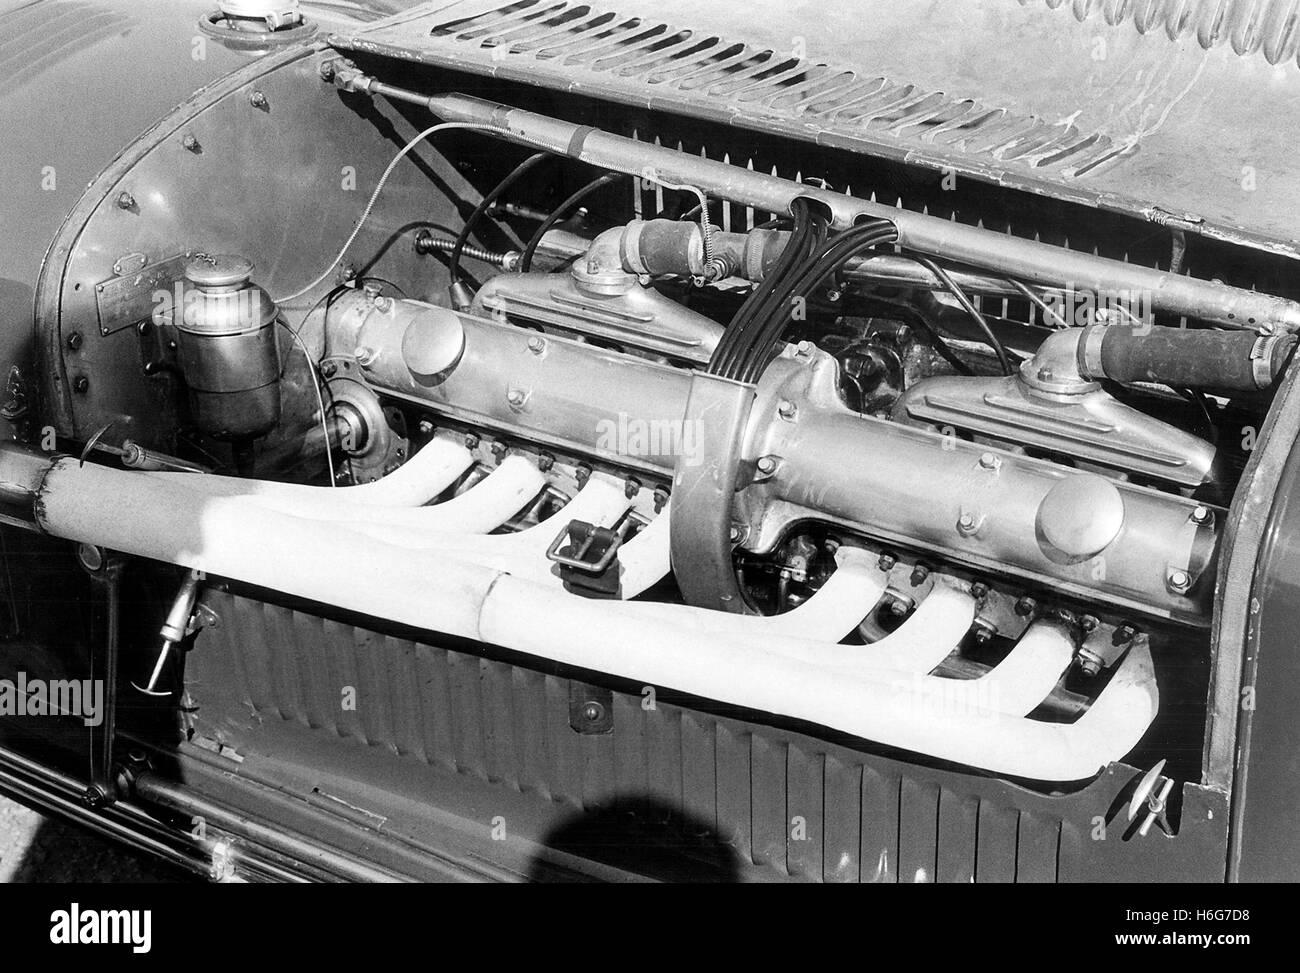 Alfa Romeo 8C Motor Stockbild